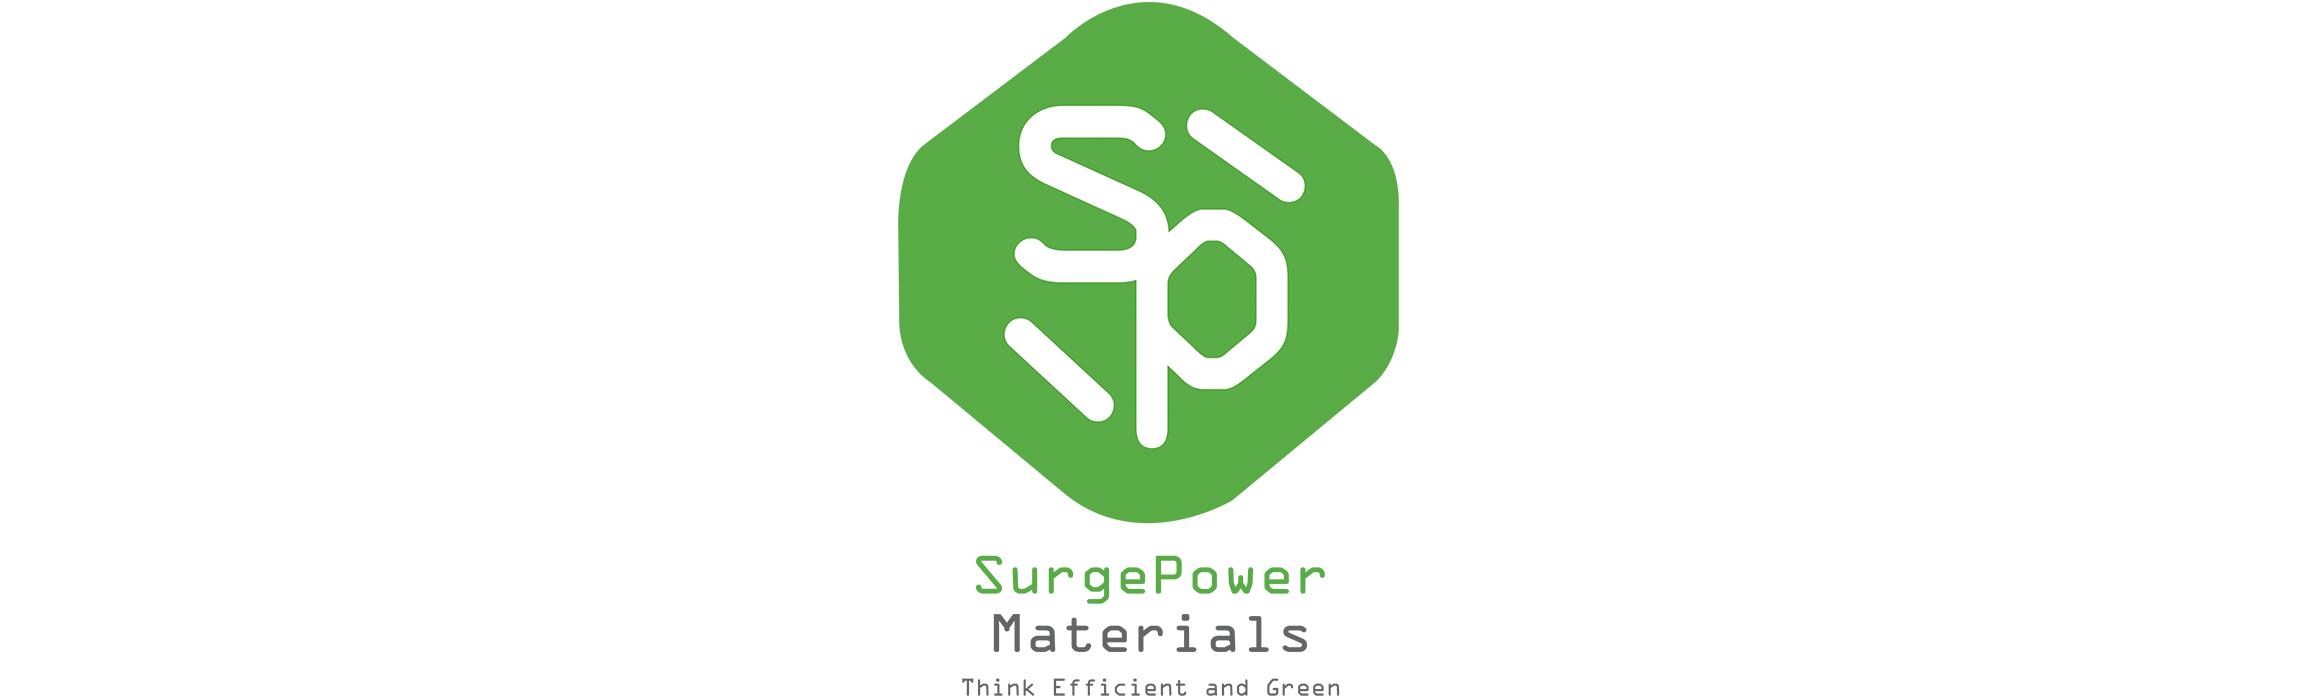 surgepower_resizedlogo.png